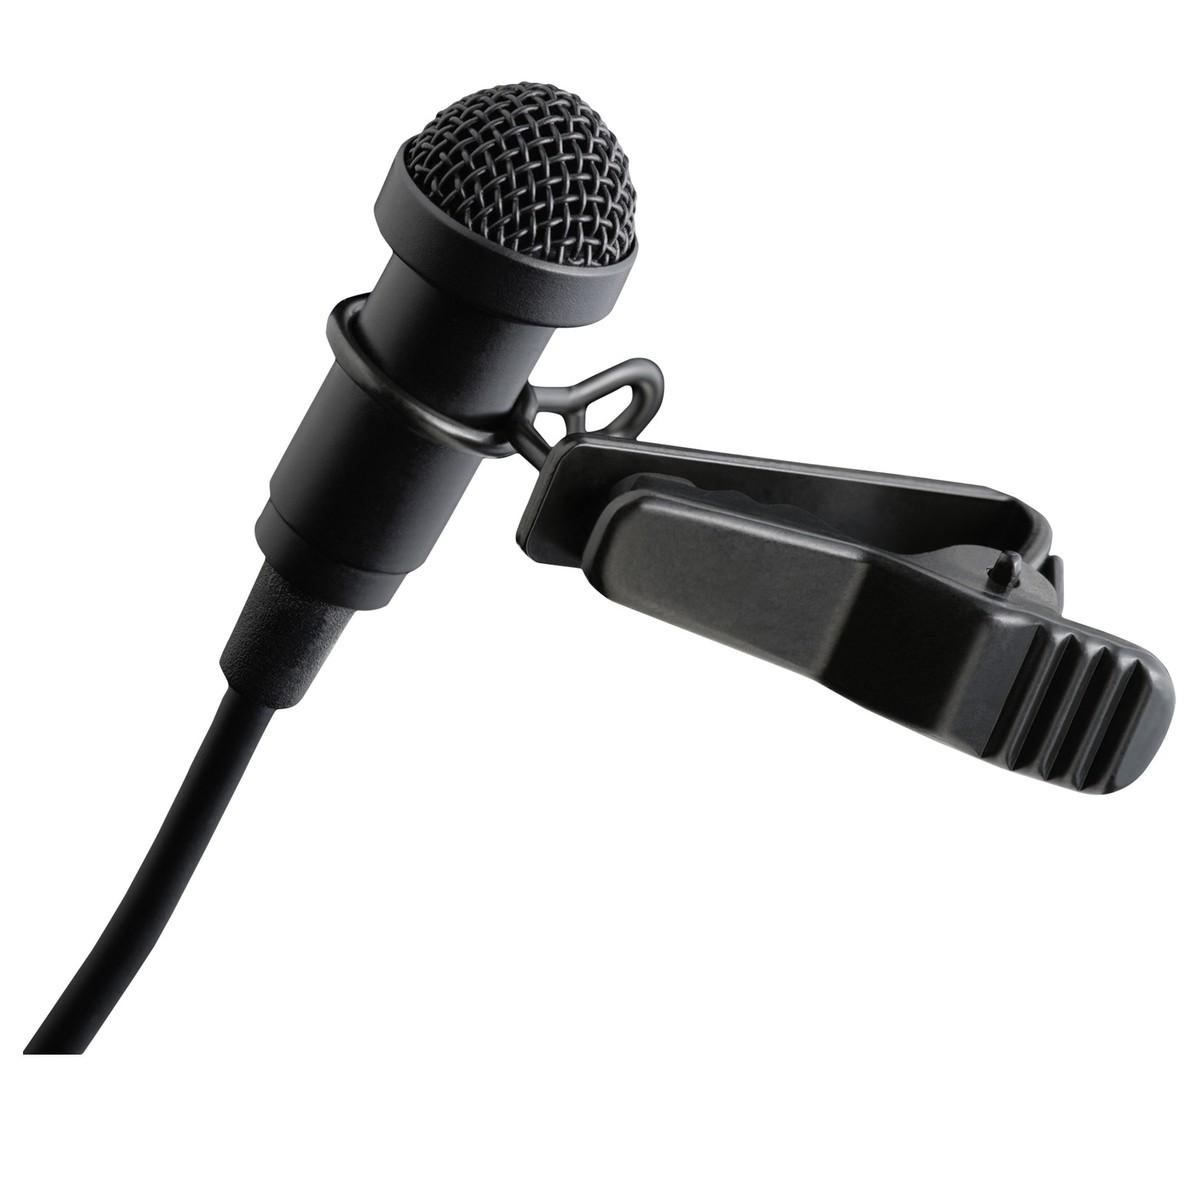 Sennheiser Me2 Us Lapel Microphone At Gear4music